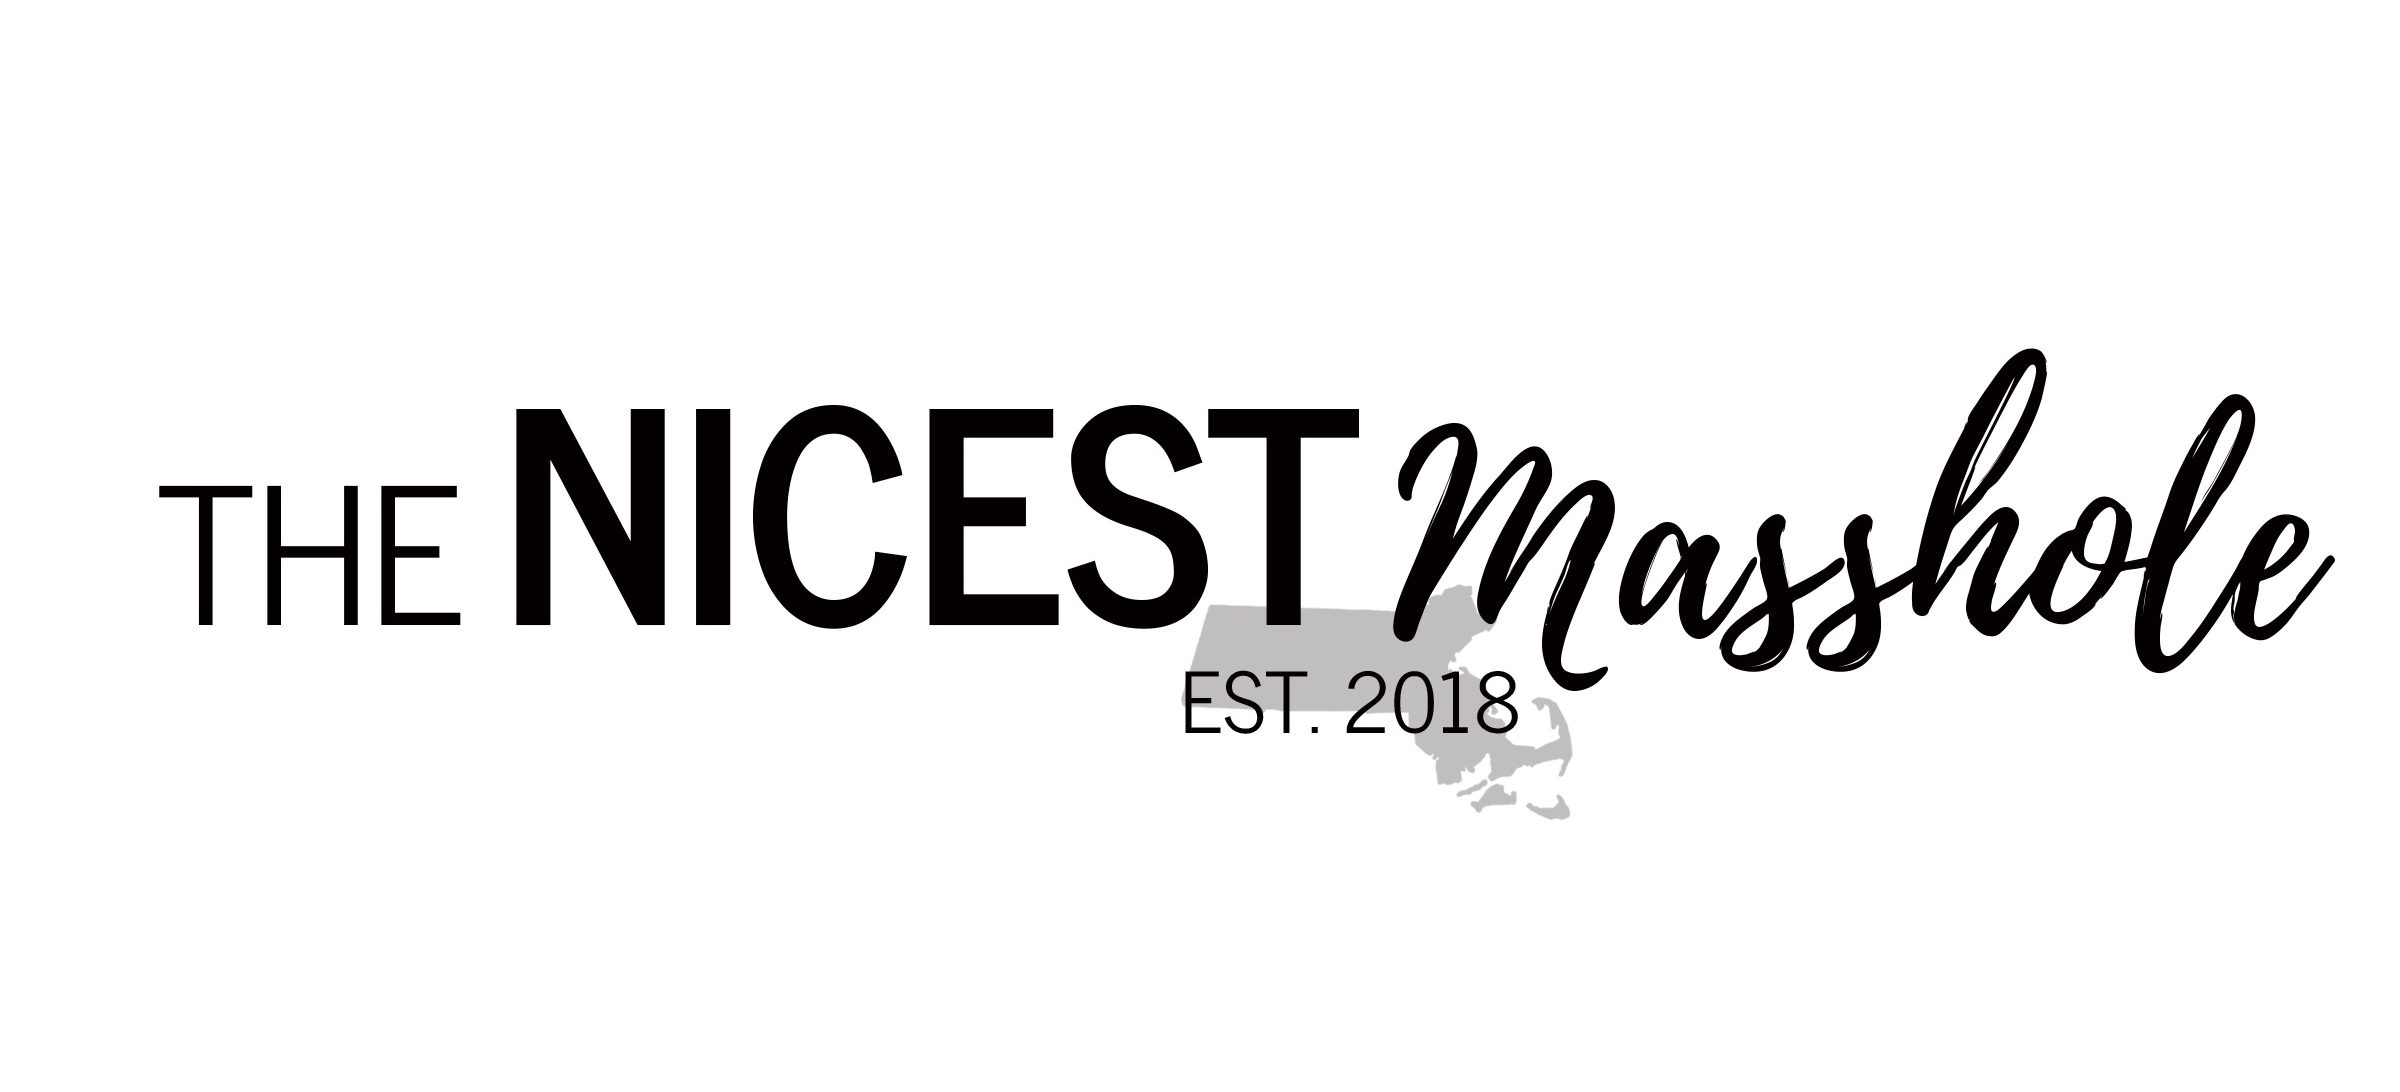 The Nicest Masshole